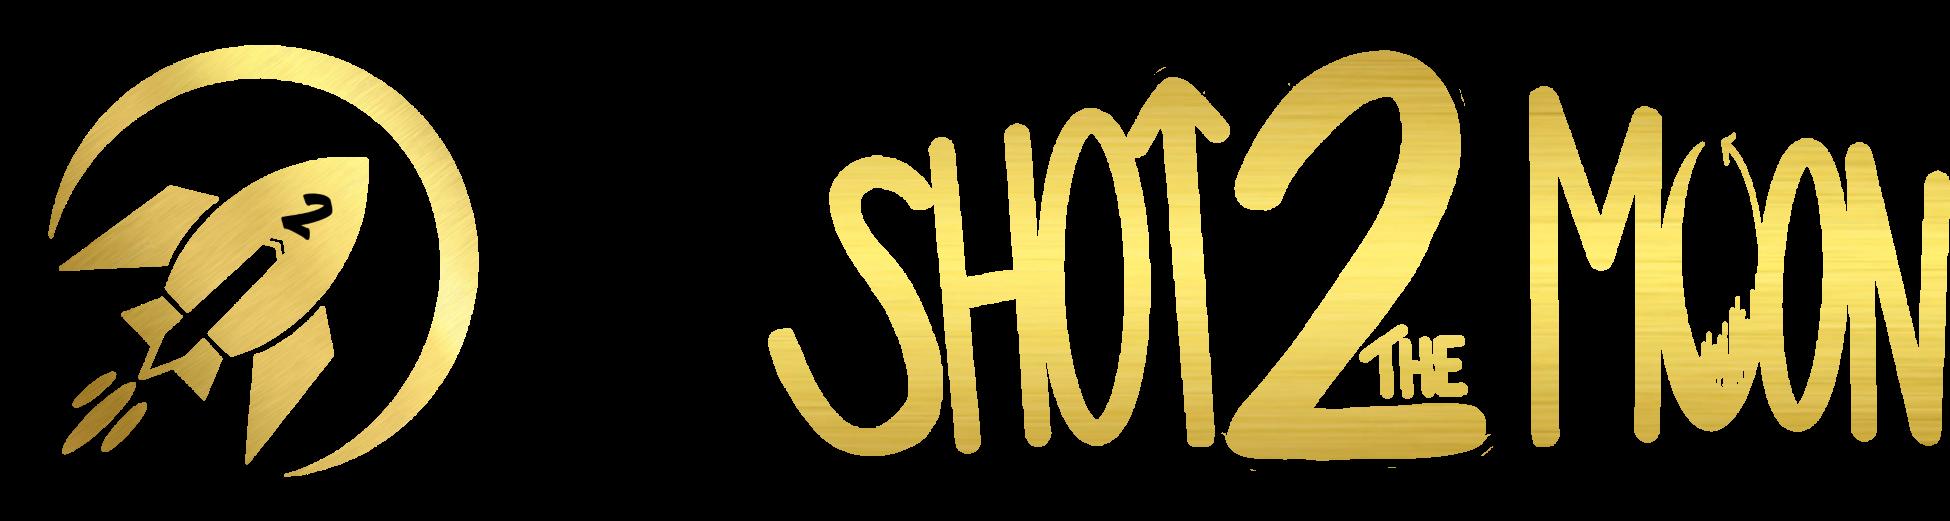 Shot2TheMoon